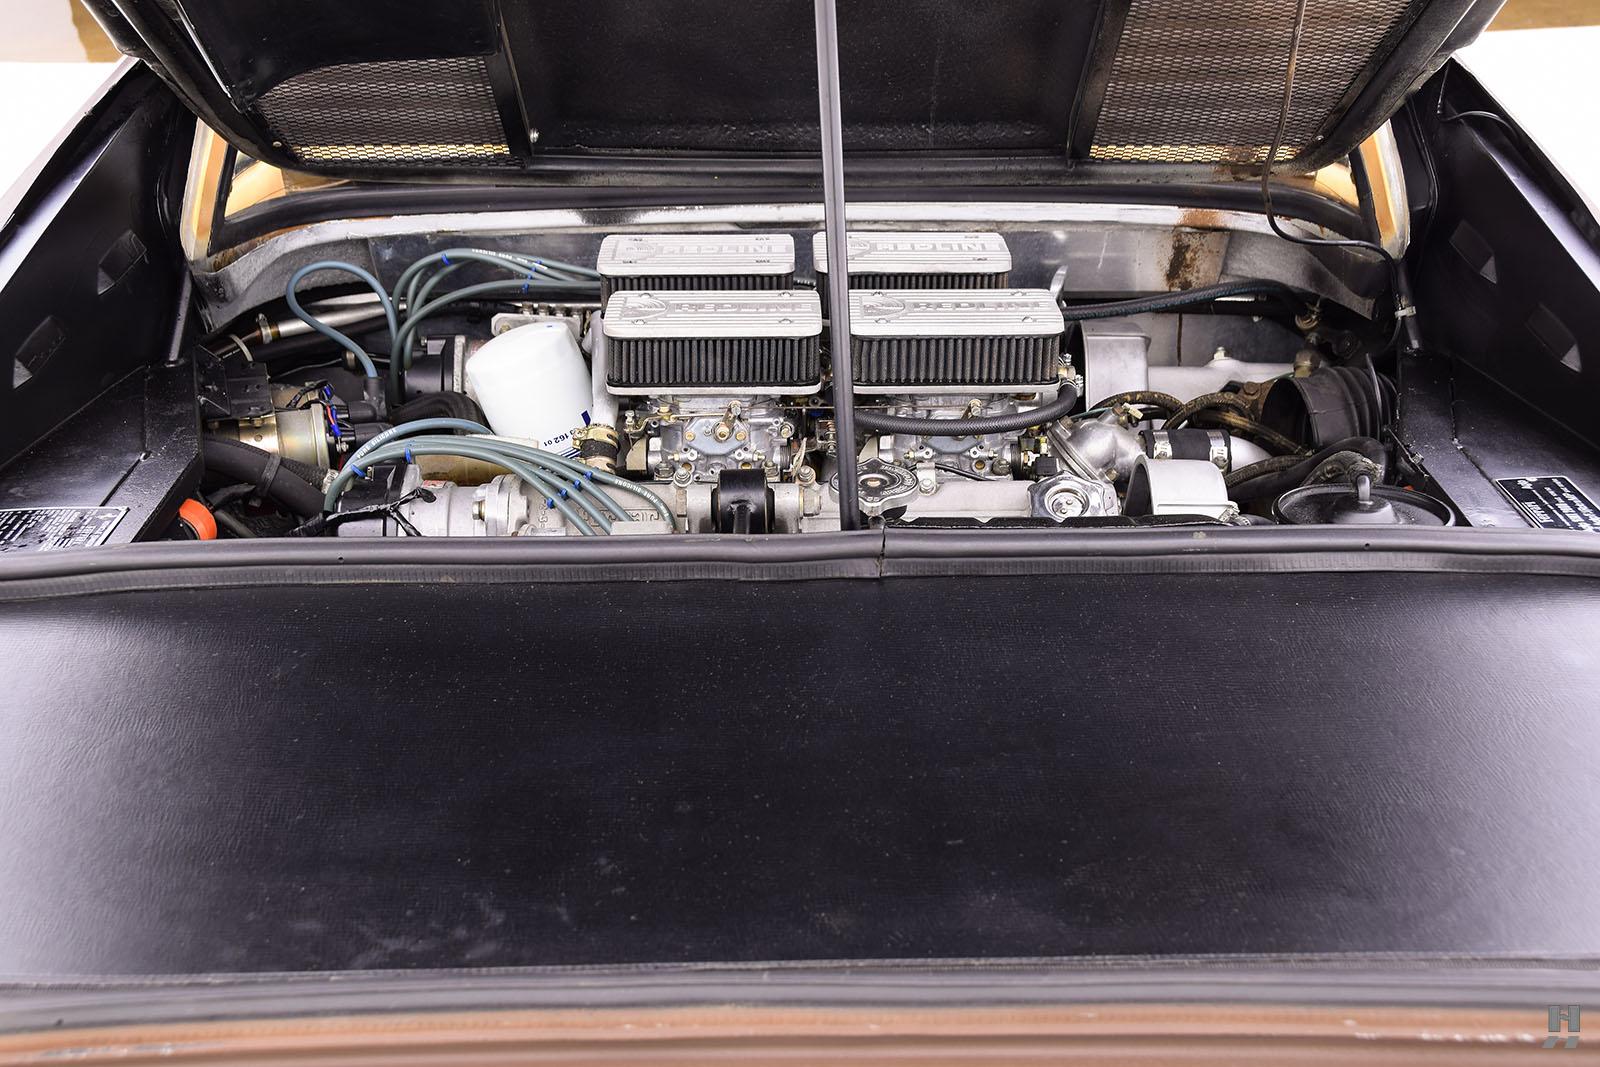 Auto Customizer George Barris\' Kustom Ferrari 308 GTS Listed For ...